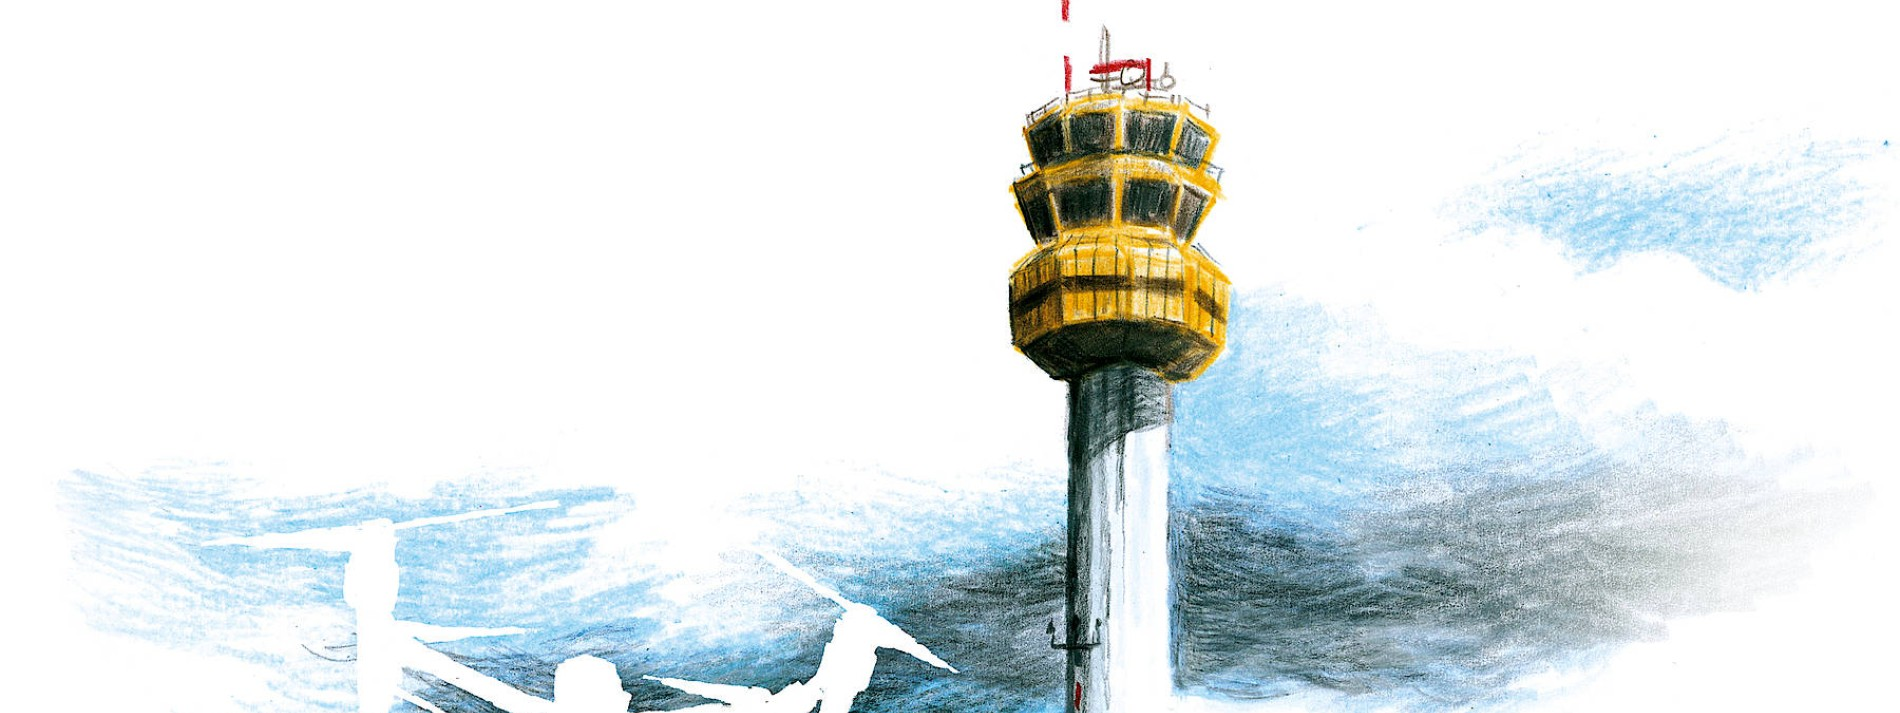 Drohne über Tower